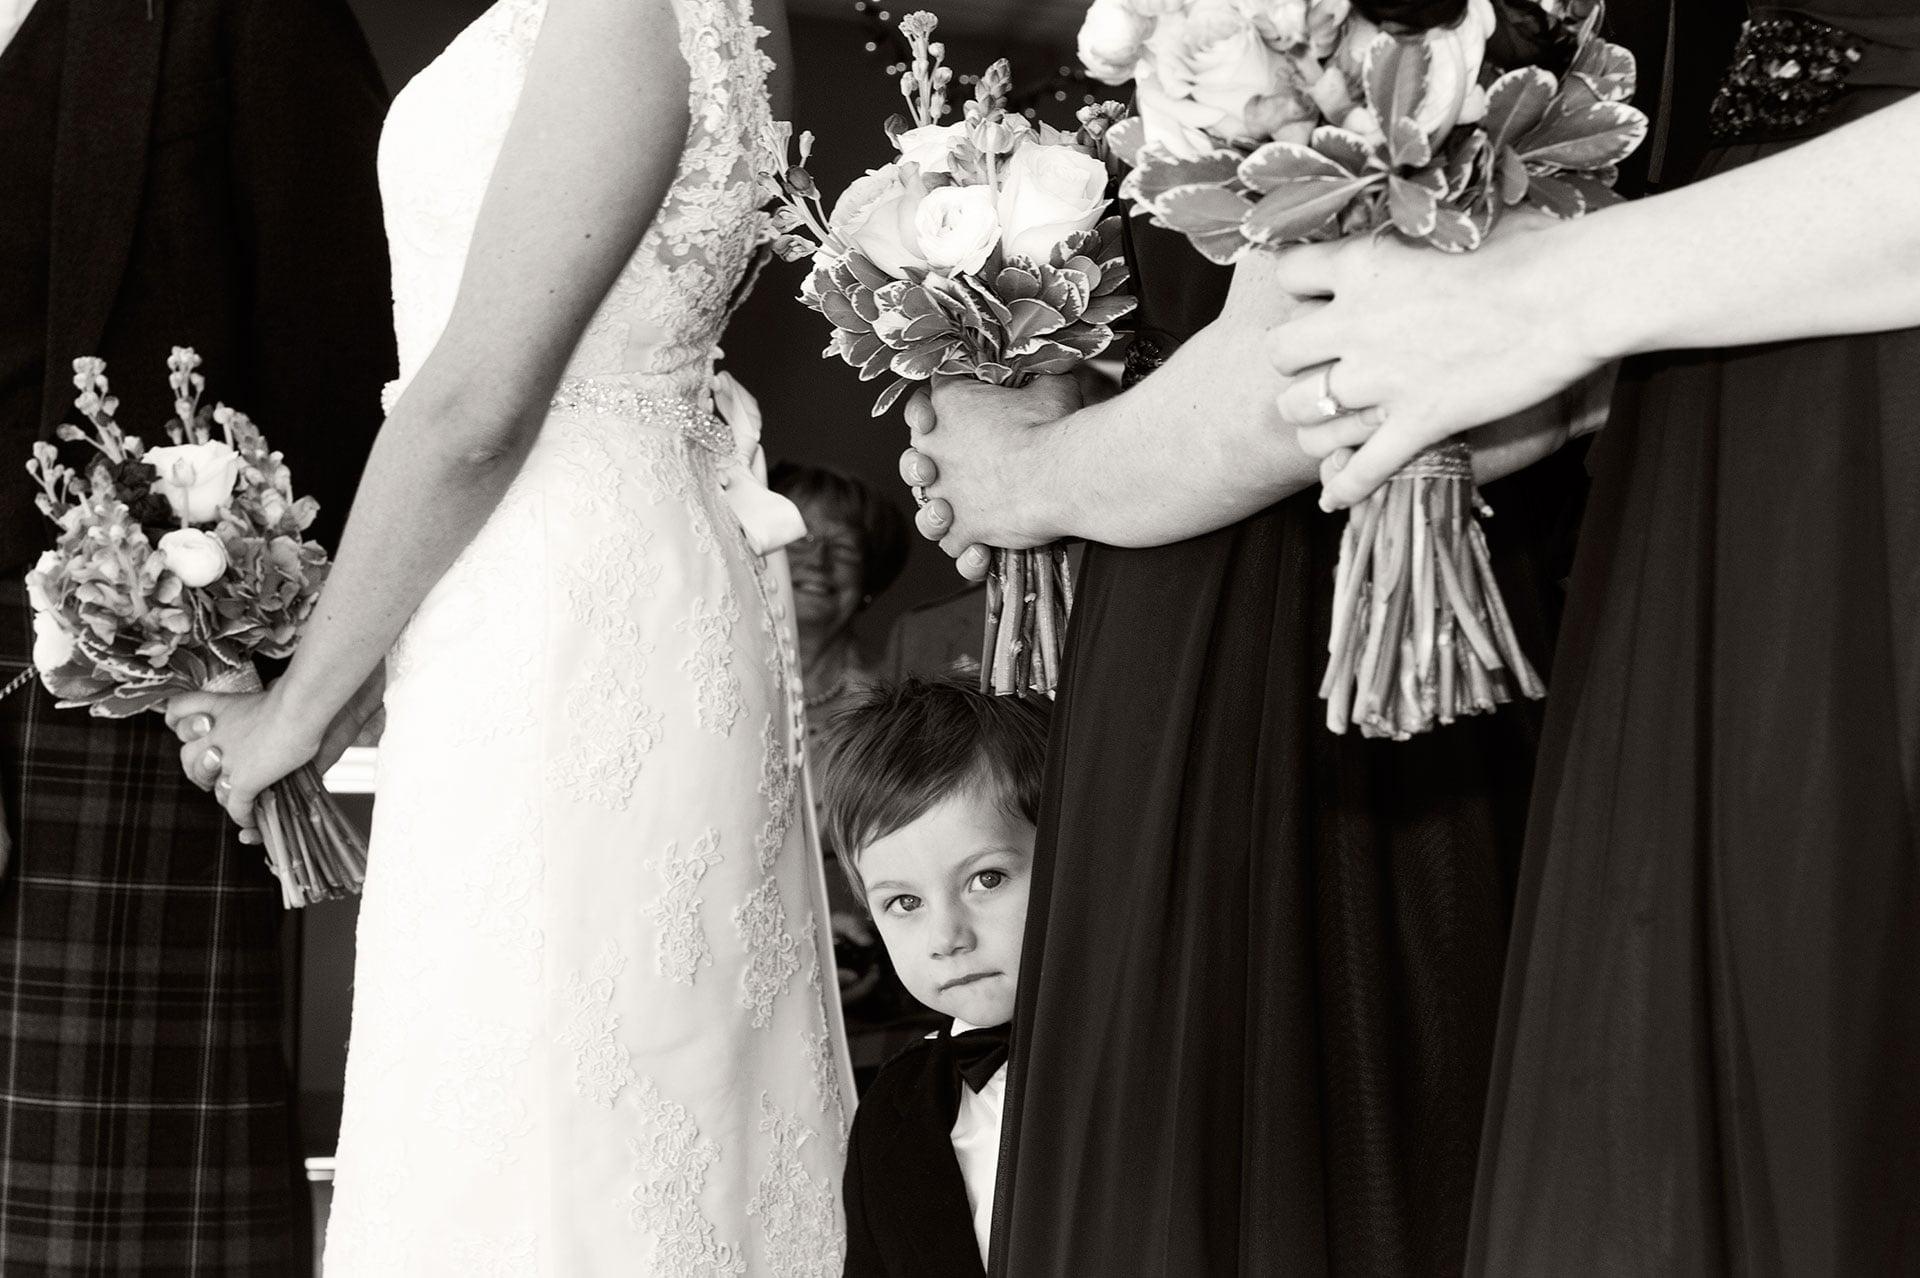 The Page boy - Loch Lomond Wedding